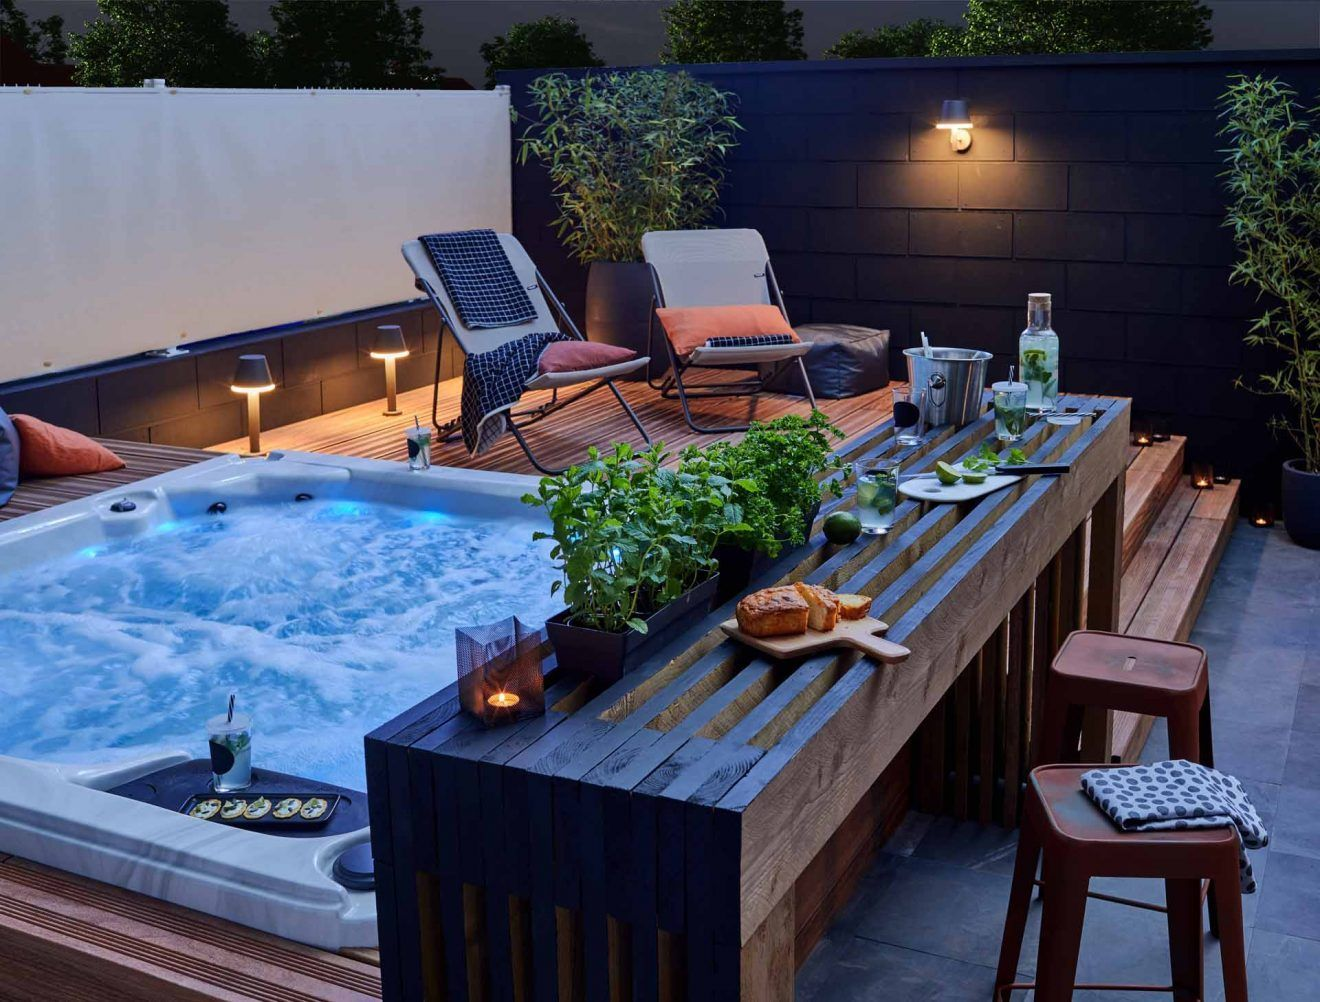 Autre Alternative Installer Un Bar Permanent Qui Resistera Aux Intemperies C Leroy Merlin Hot Tub Garden Hot Tub Backyard Hot Tub Patio